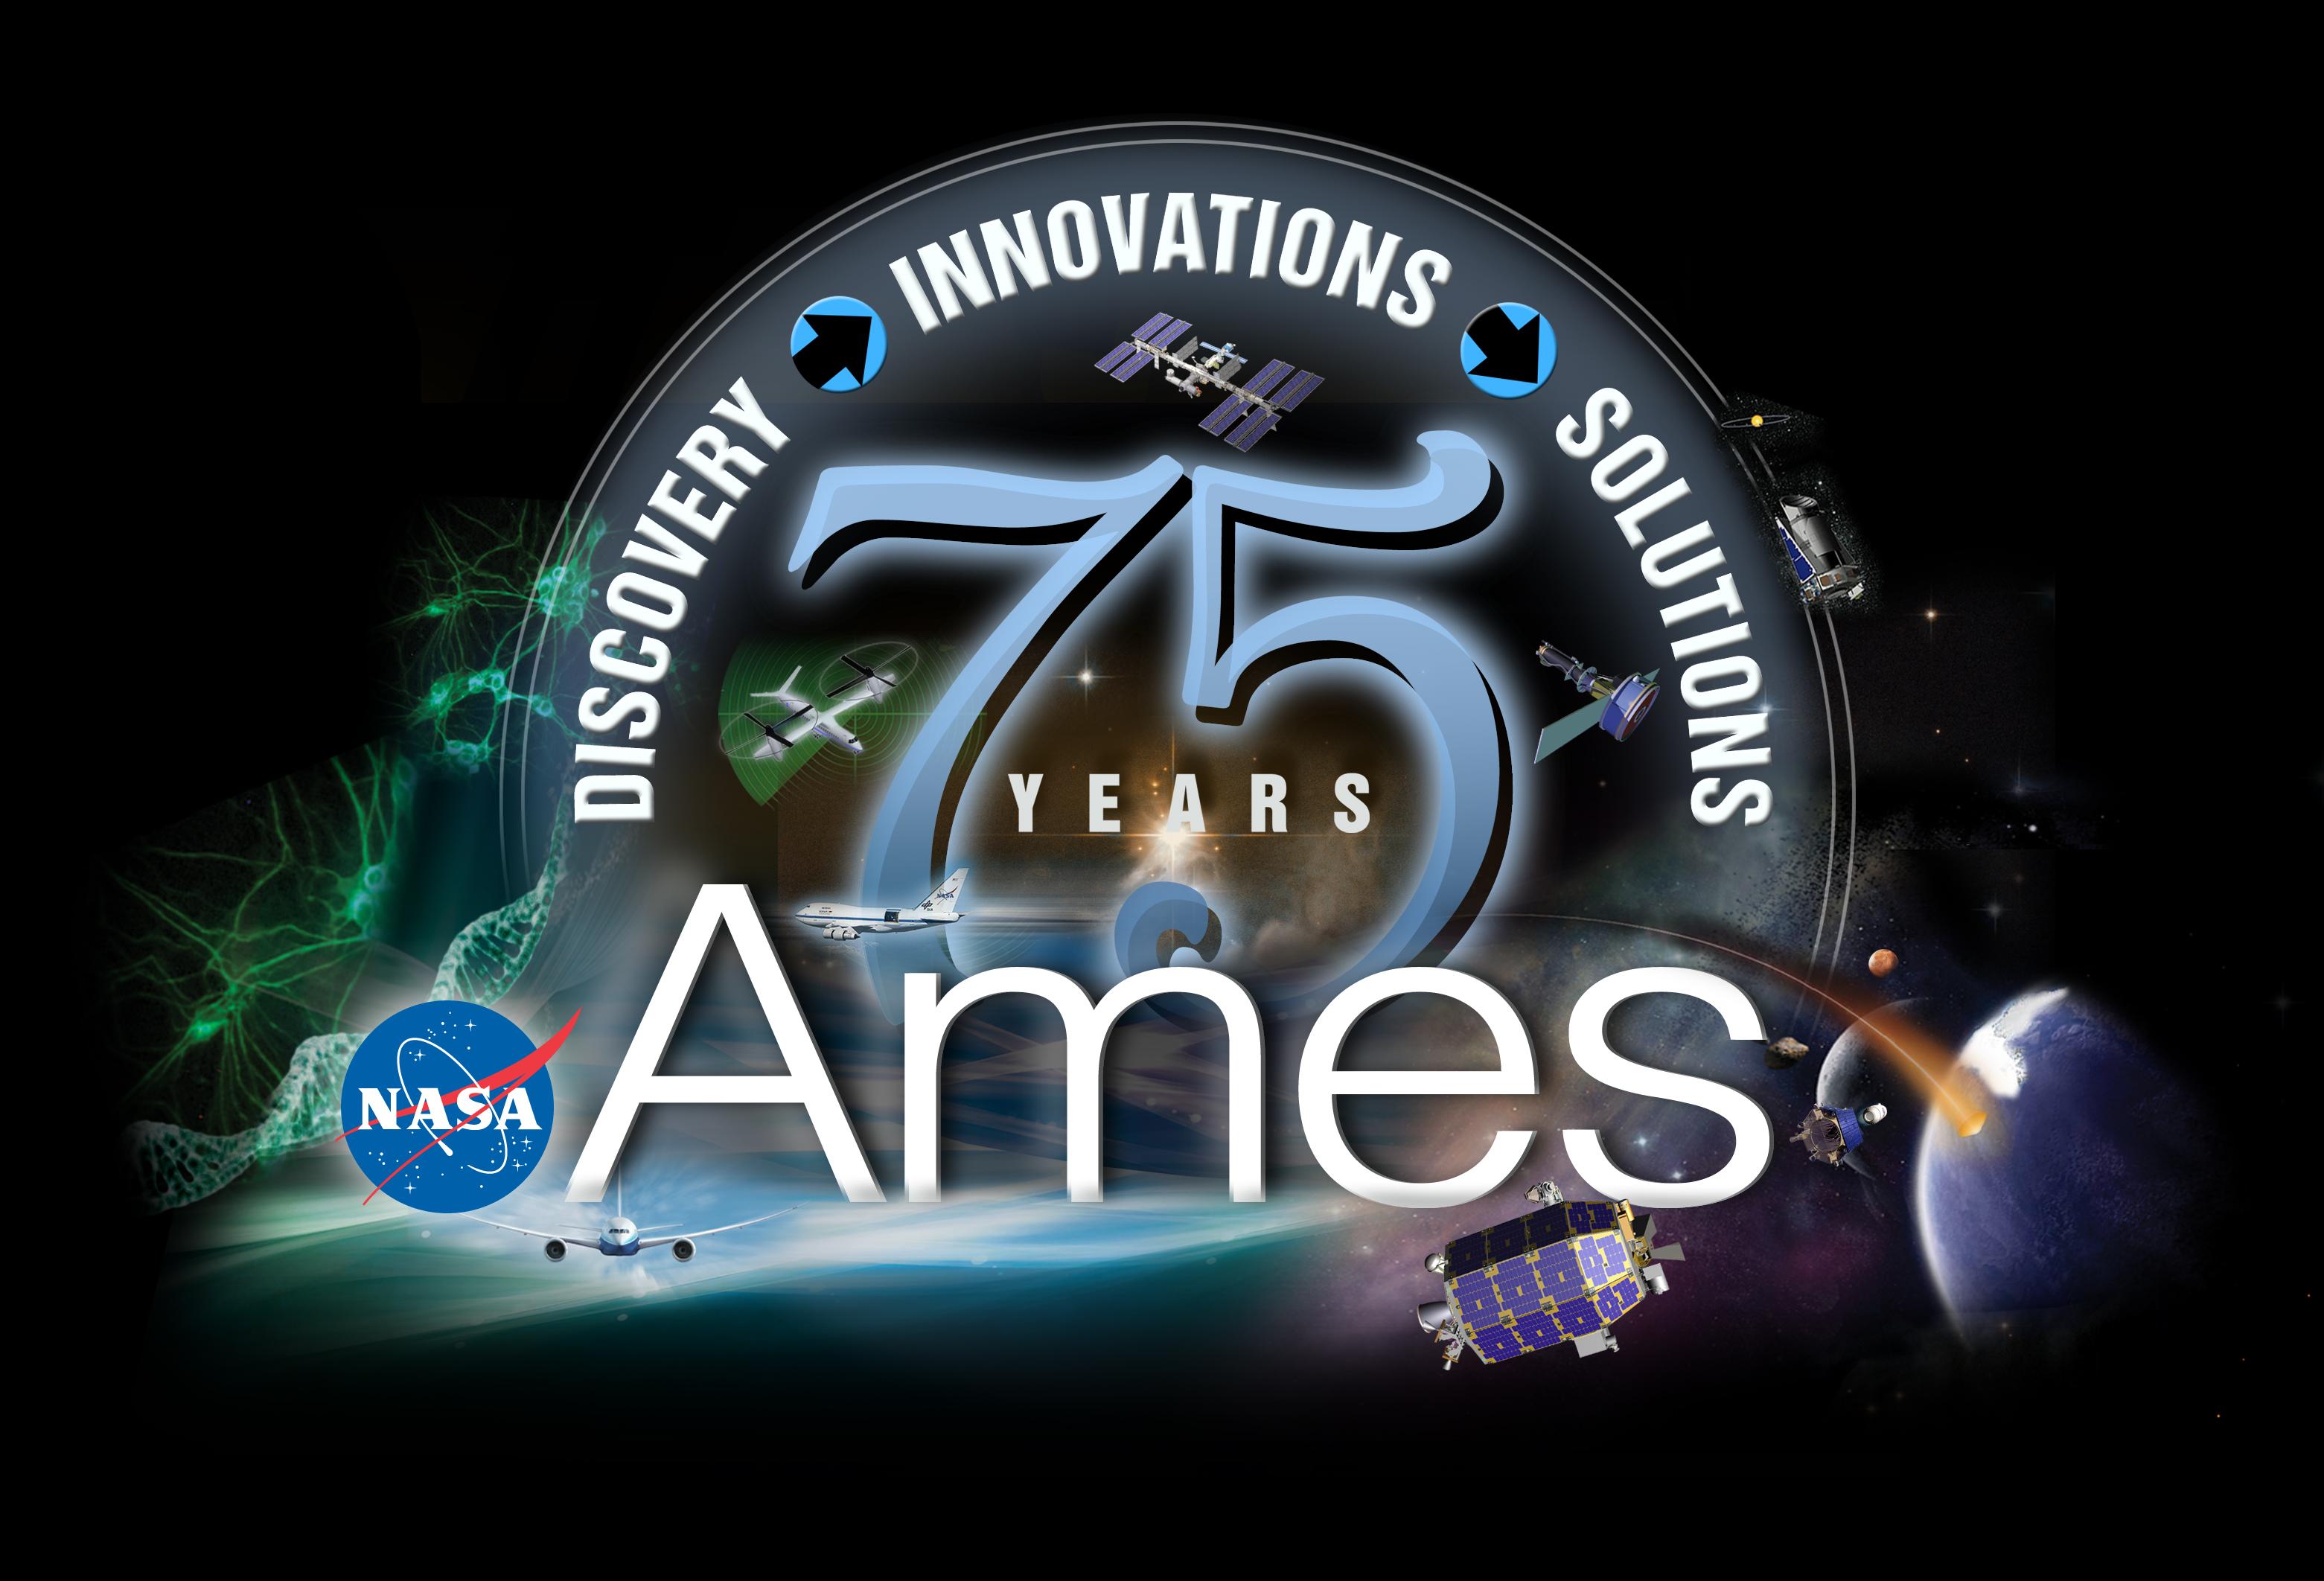 ames nasa logo - photo #18